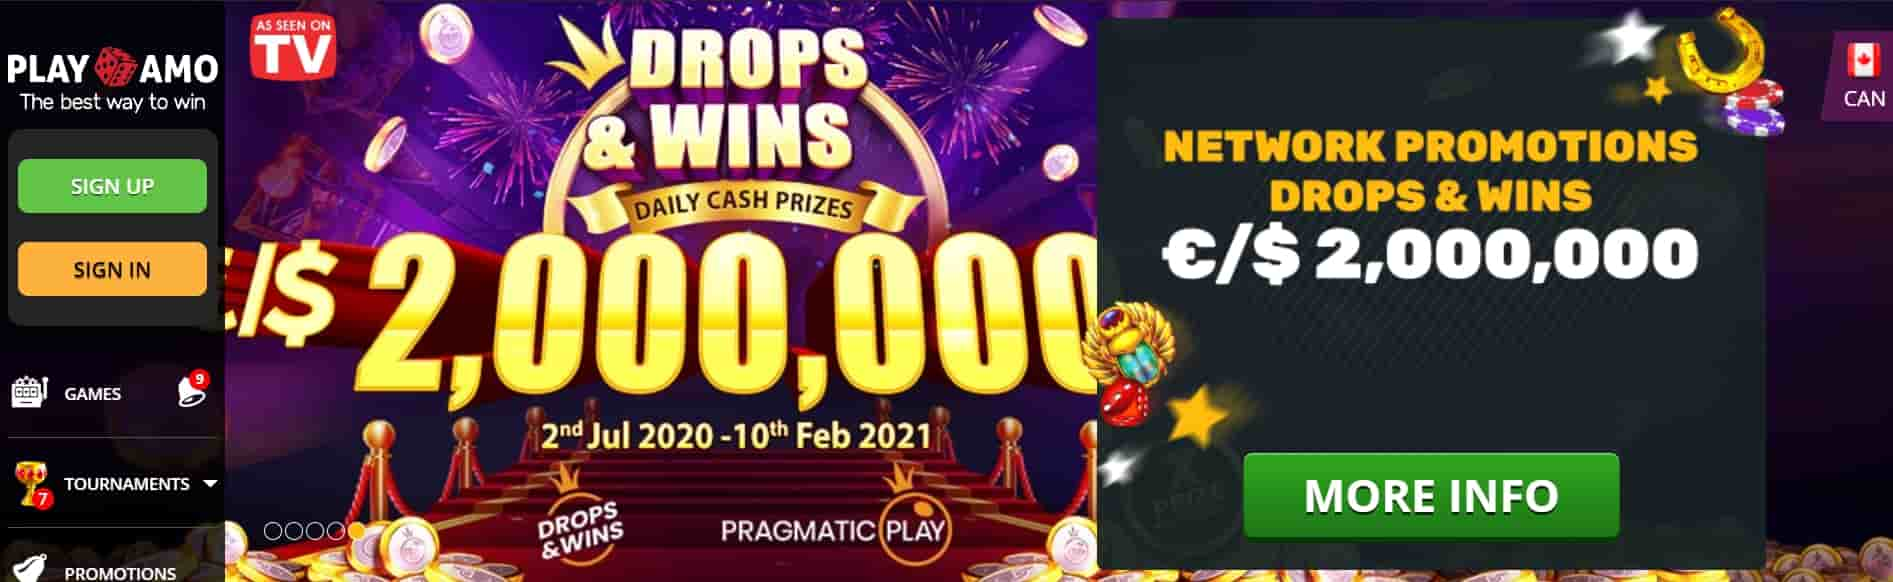 Play Amo casino online jackpot